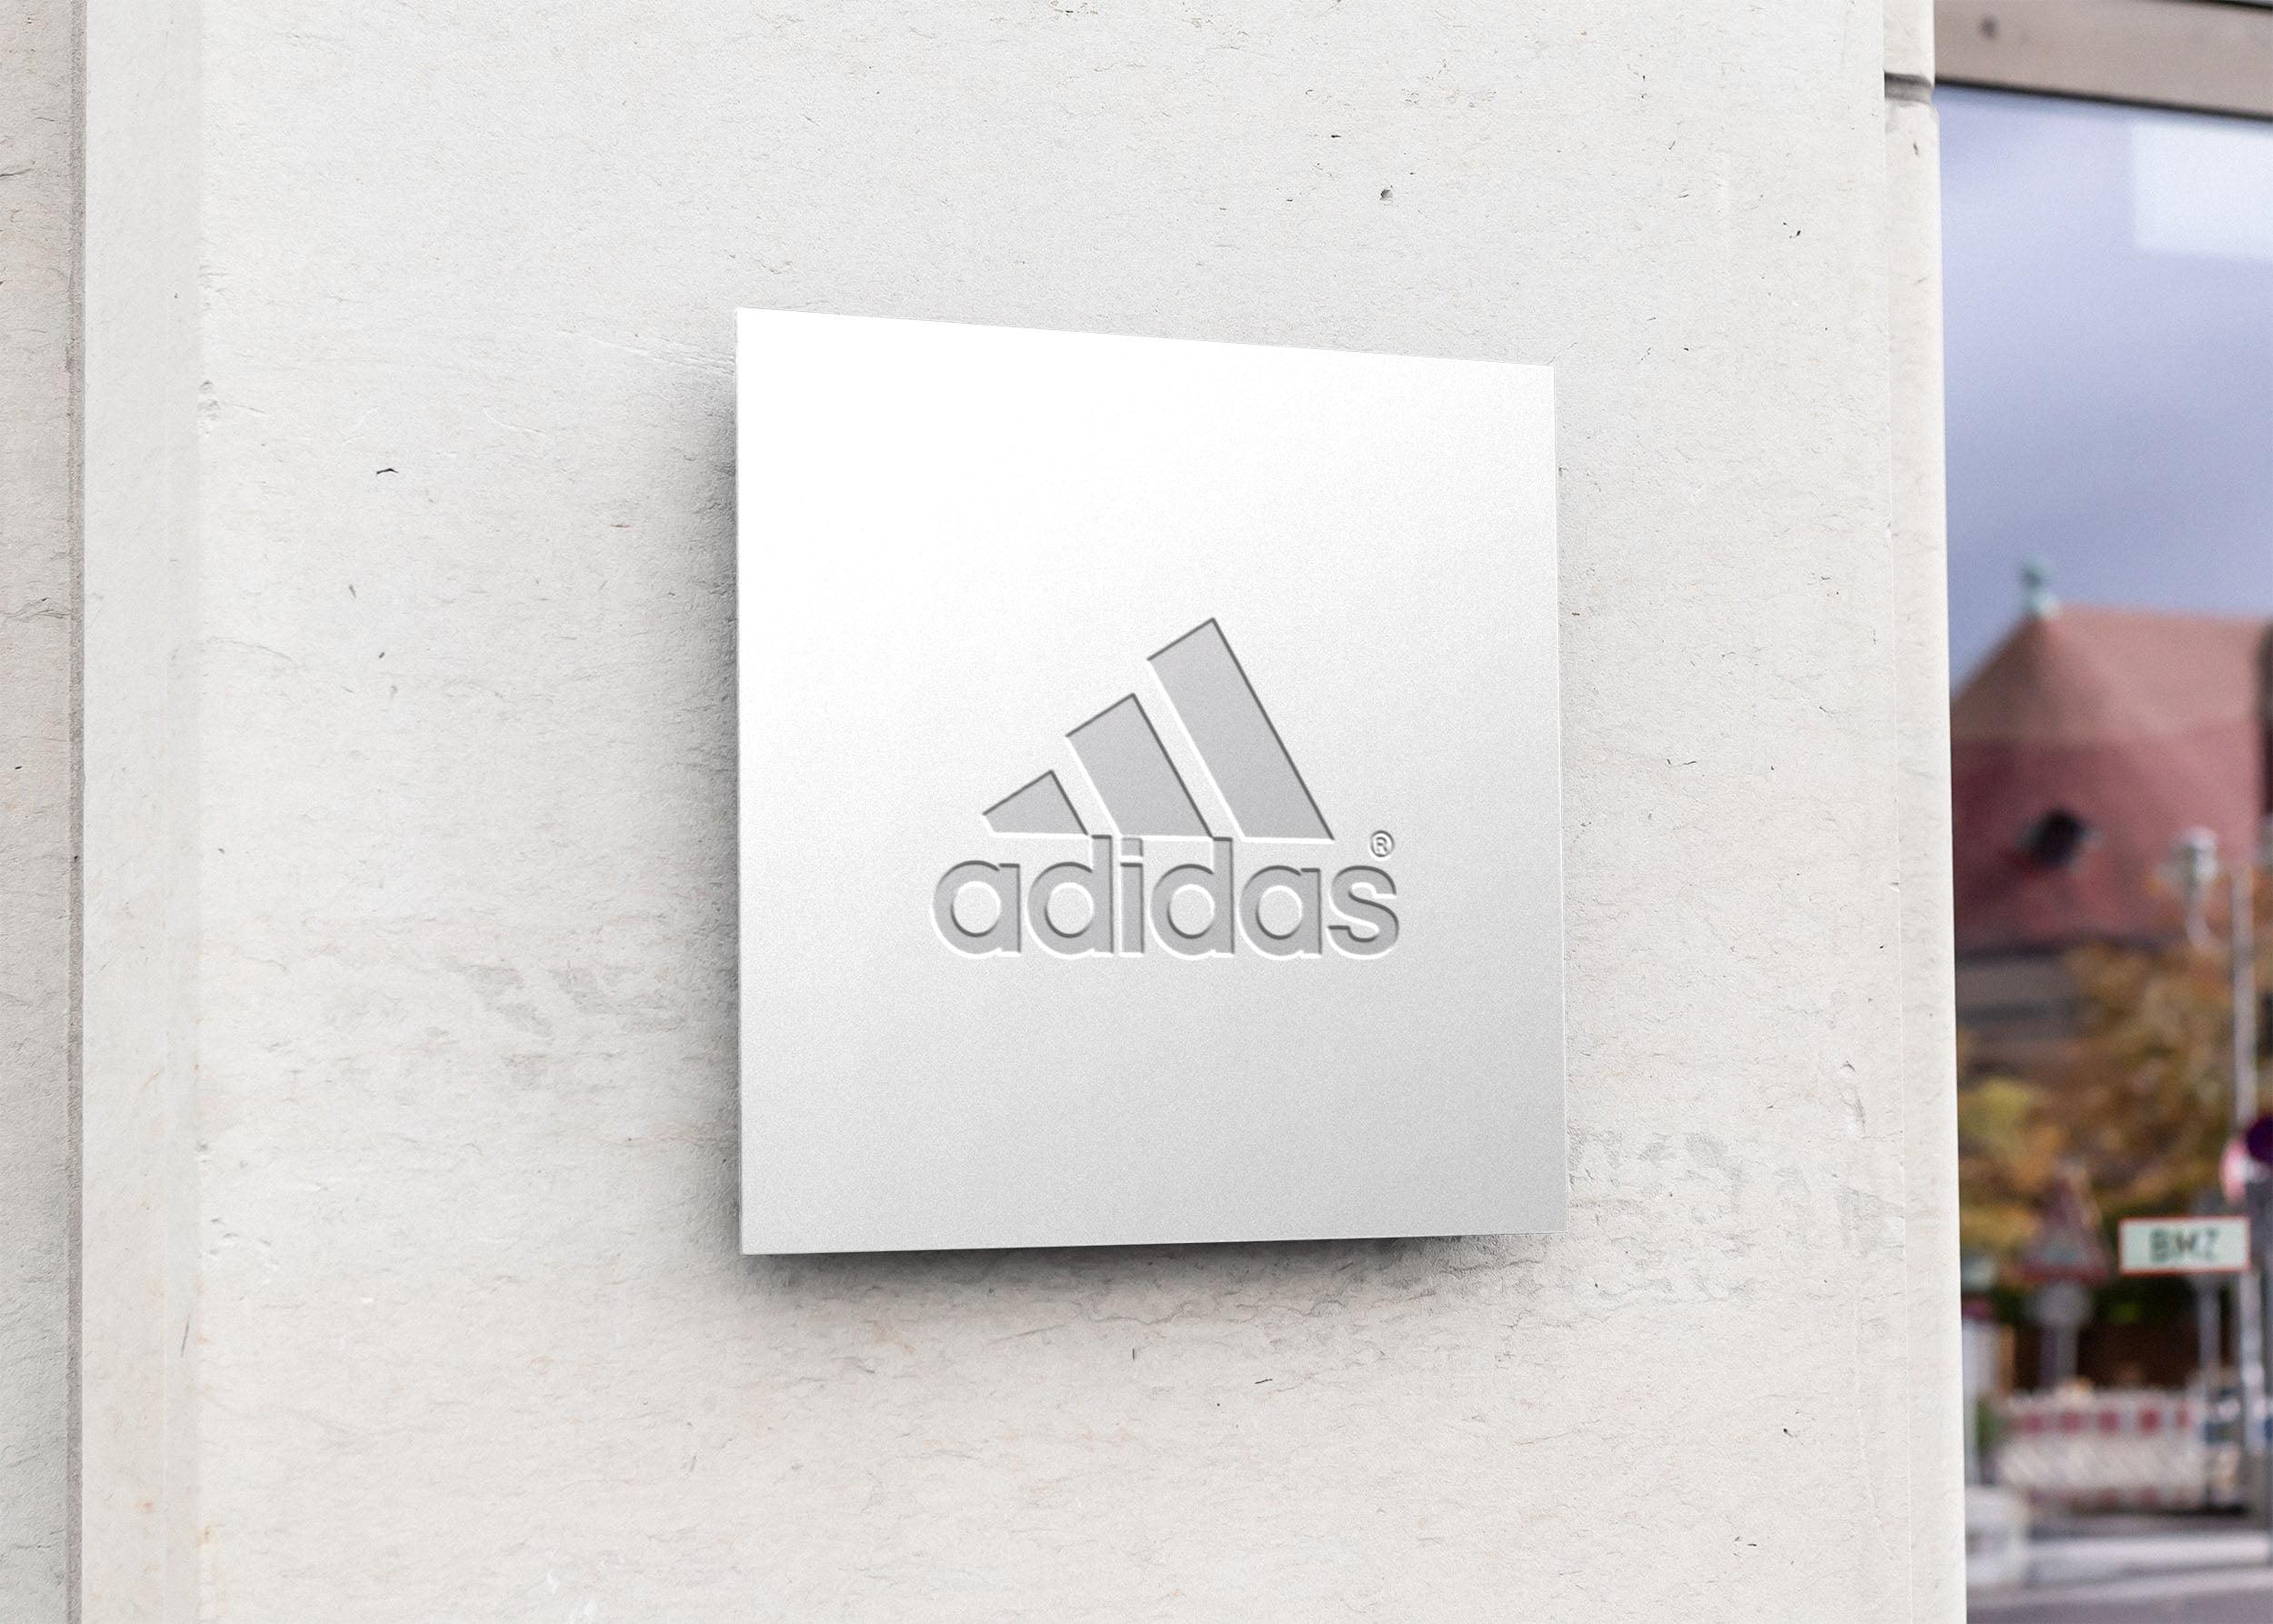 Adidas on Free Square Sign Board Mockup